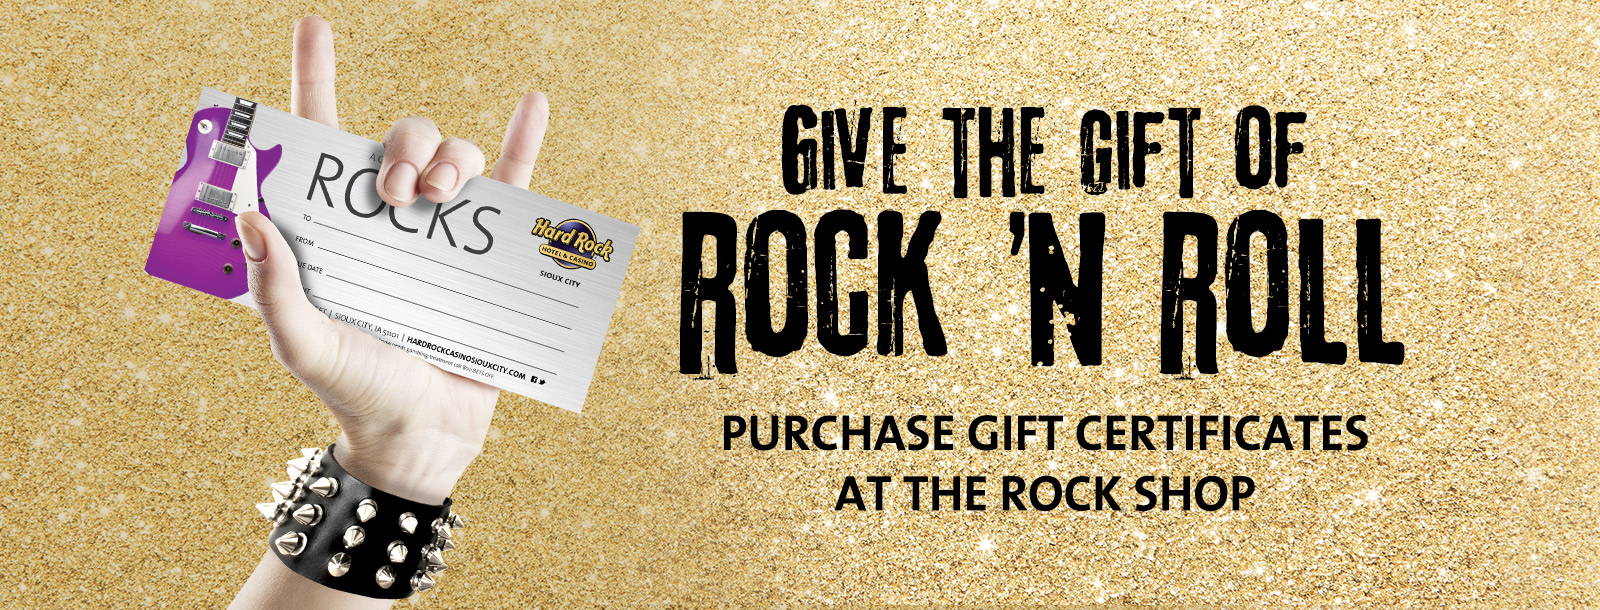 rock shop gift certificates